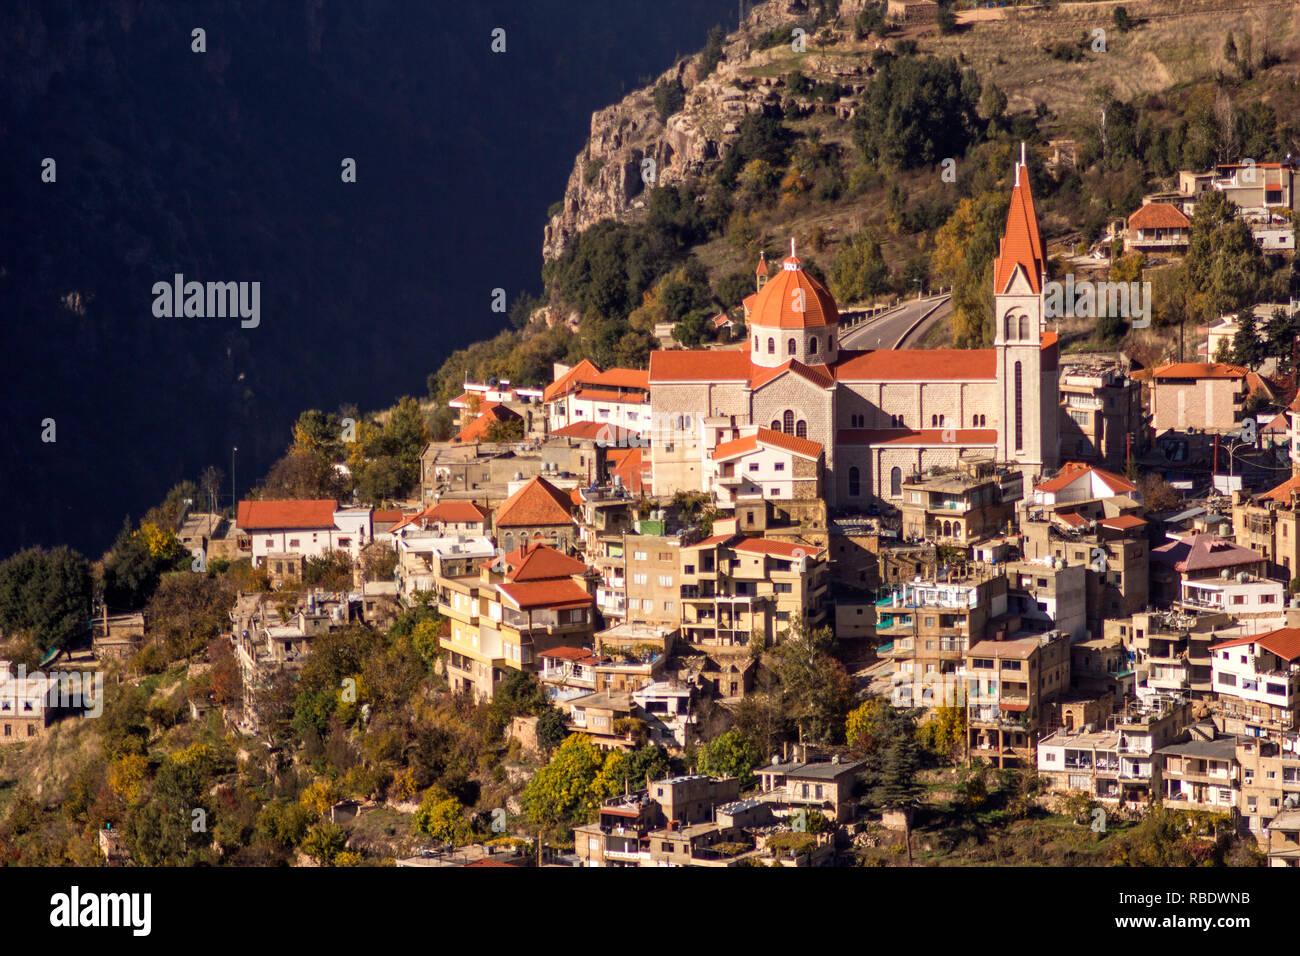 Saint Saba Church or Mar Saba Cathedral, the Maronite Church in Bsharri town near Qadisha Valley and Kadisha Gorge. Bcharreh, Liban-Nord, Lebanon. - Stock Image